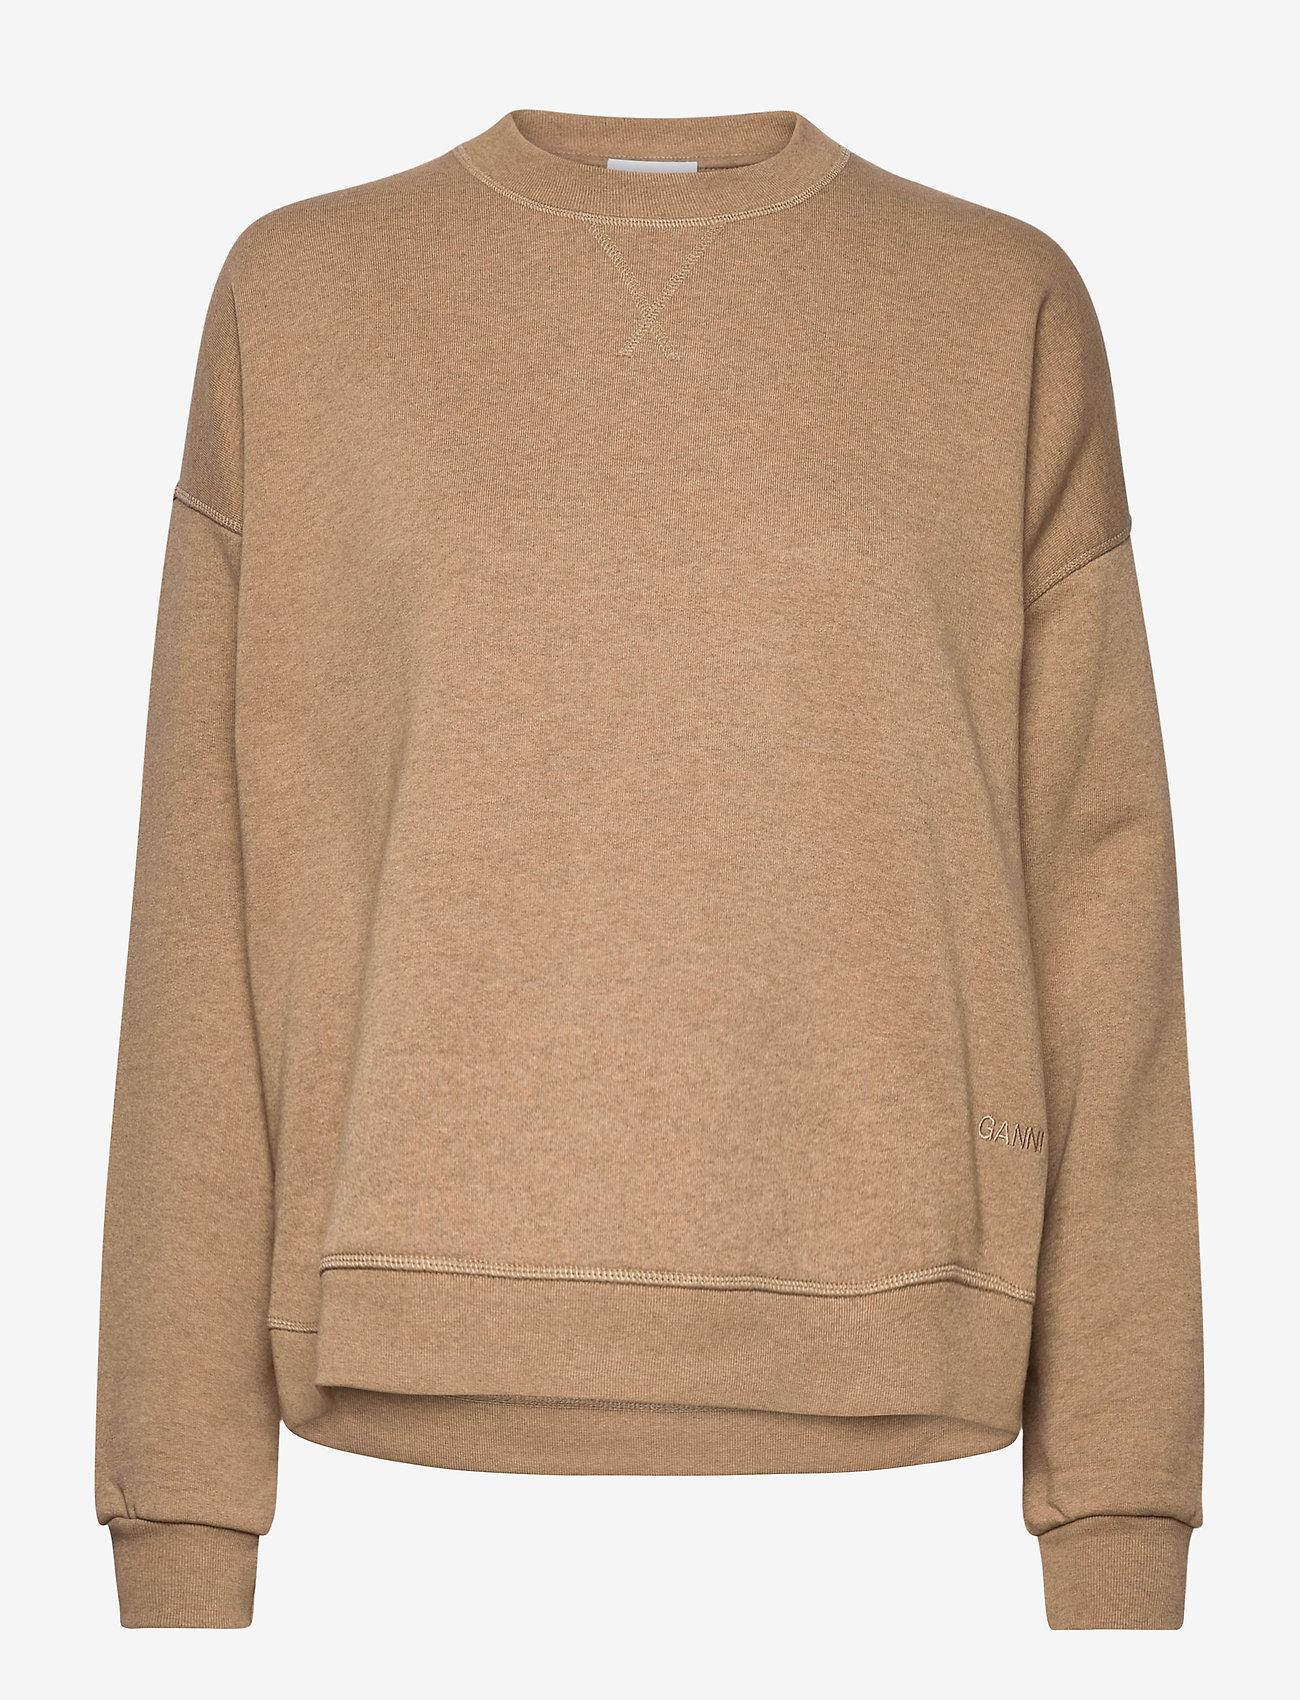 Ganni - Isoli - sweatshirts & hoodies - tannin - 0